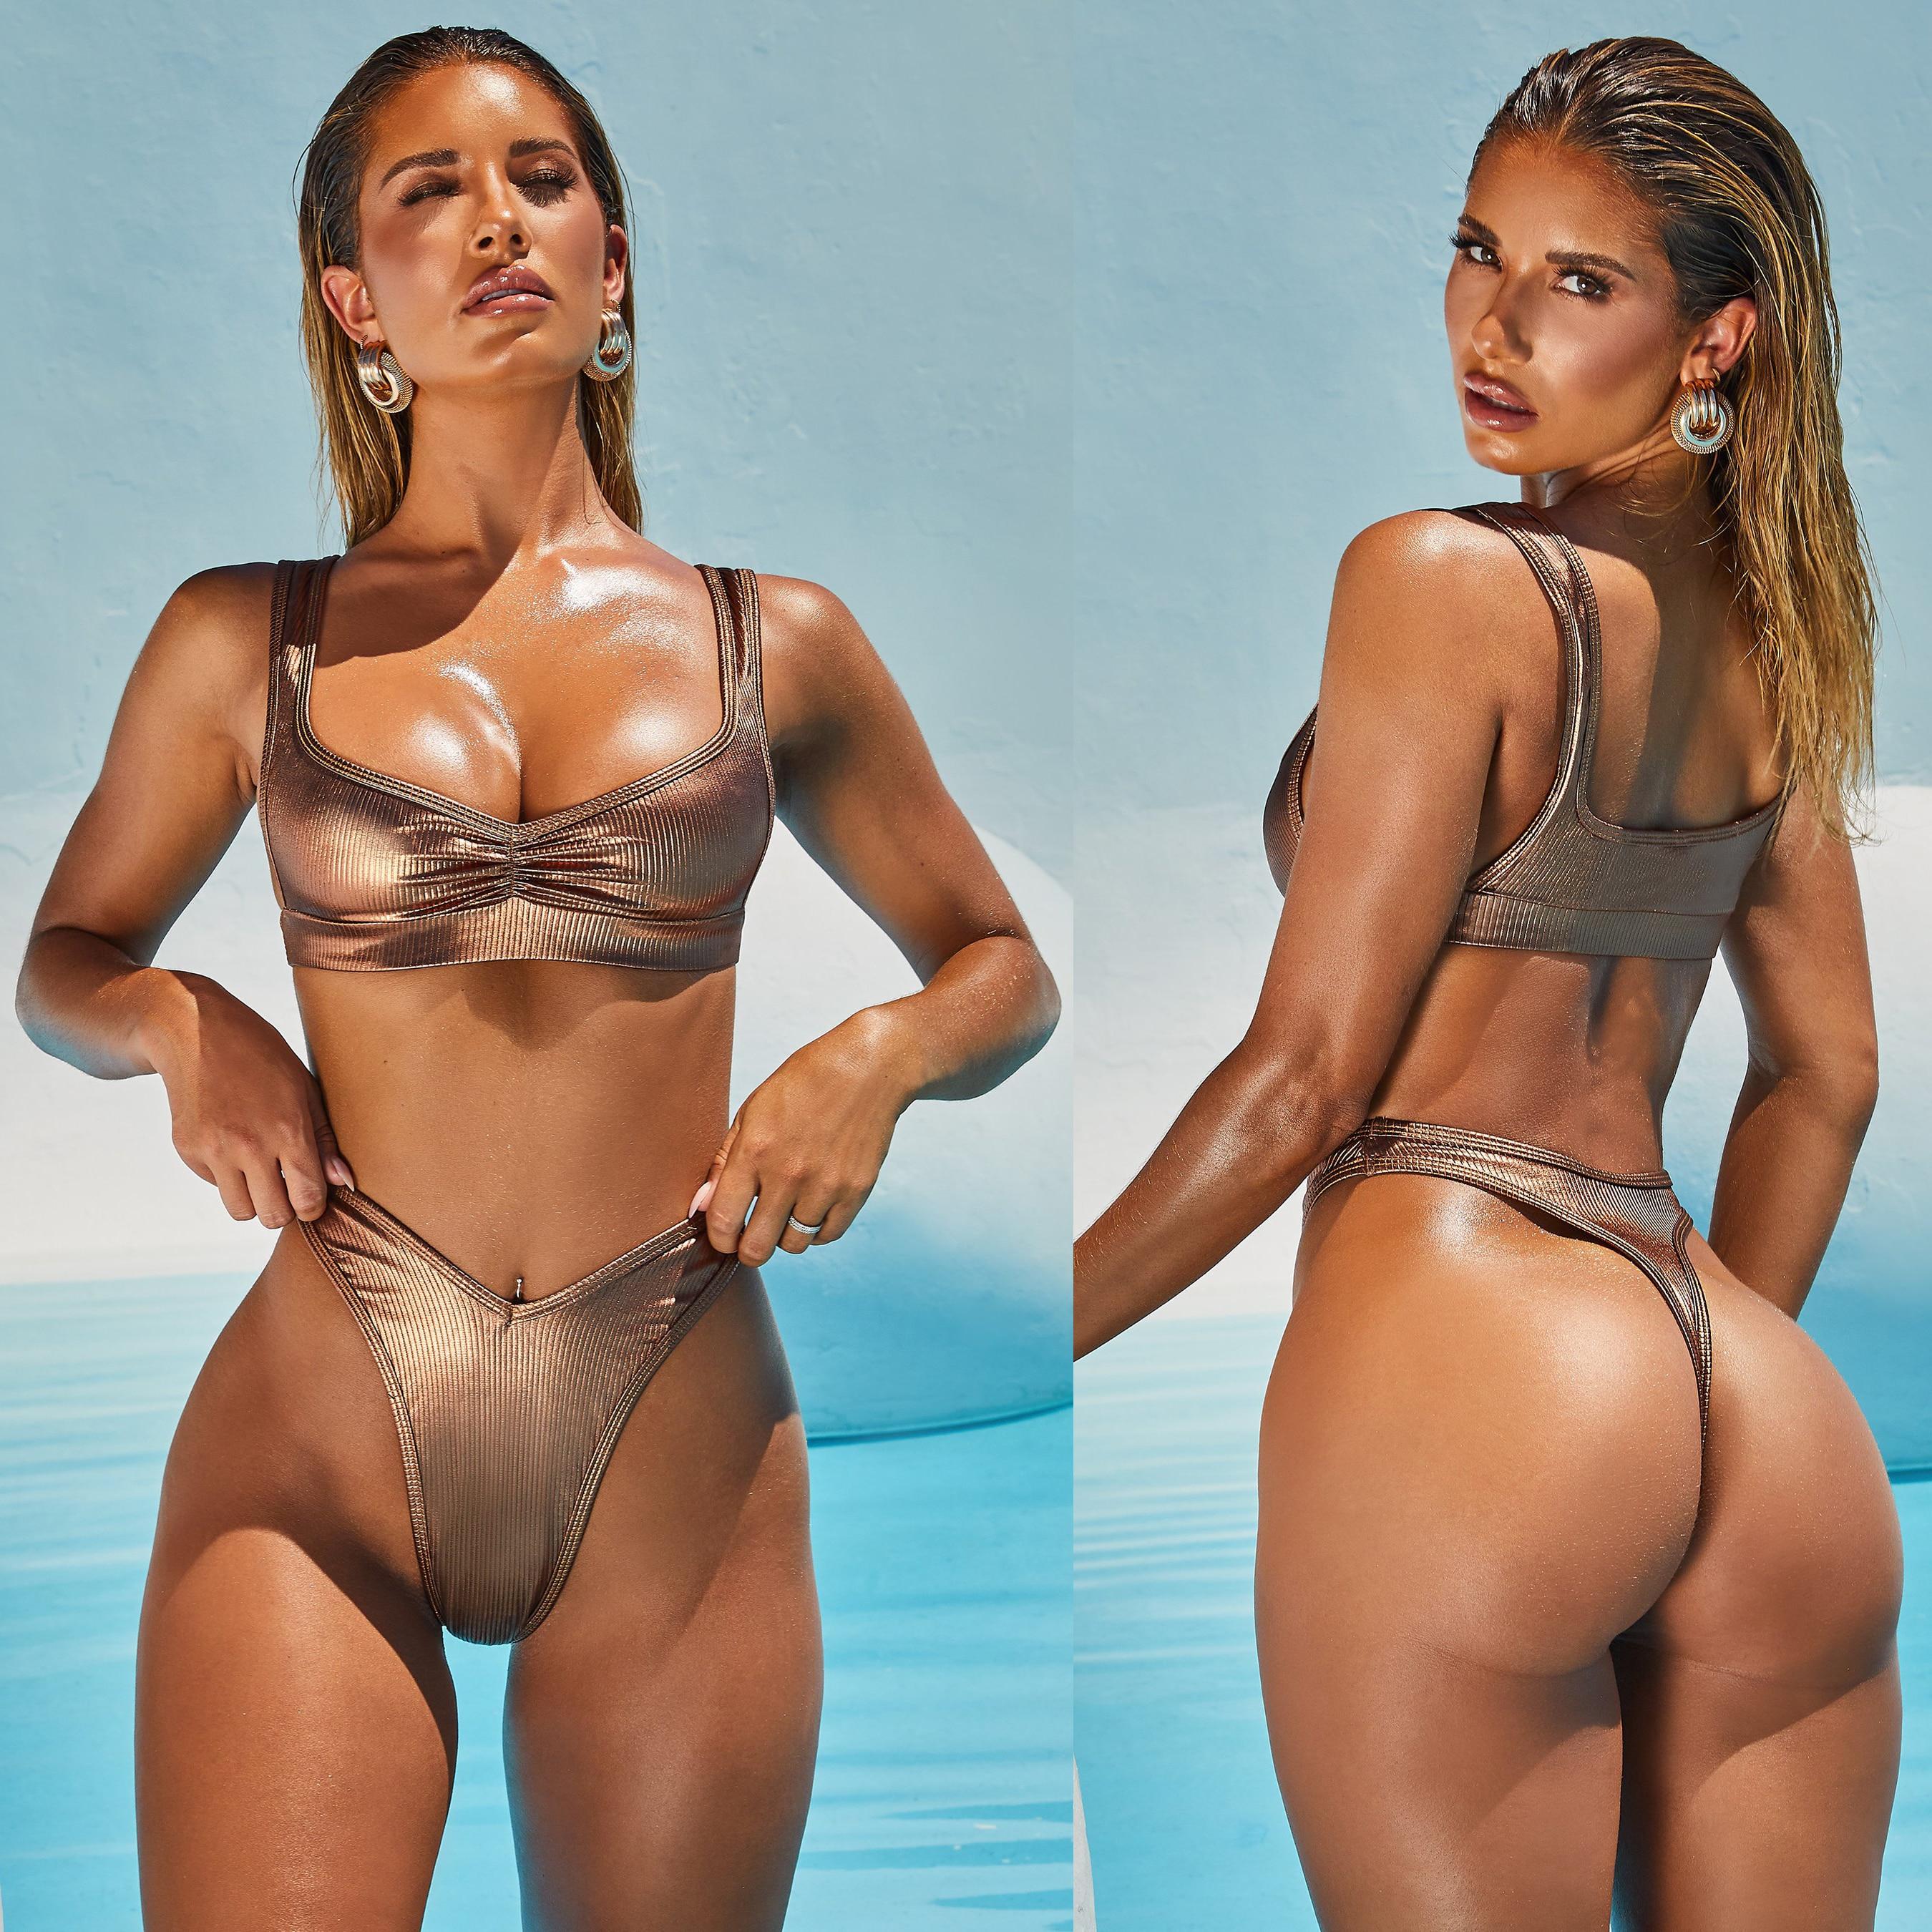 Hirigin Sexy Thong Bikini Women 2020 New Swimwear Summer Push Up Padded Bathing Suit Biquini Swimming Suit Brazilian Beachwear